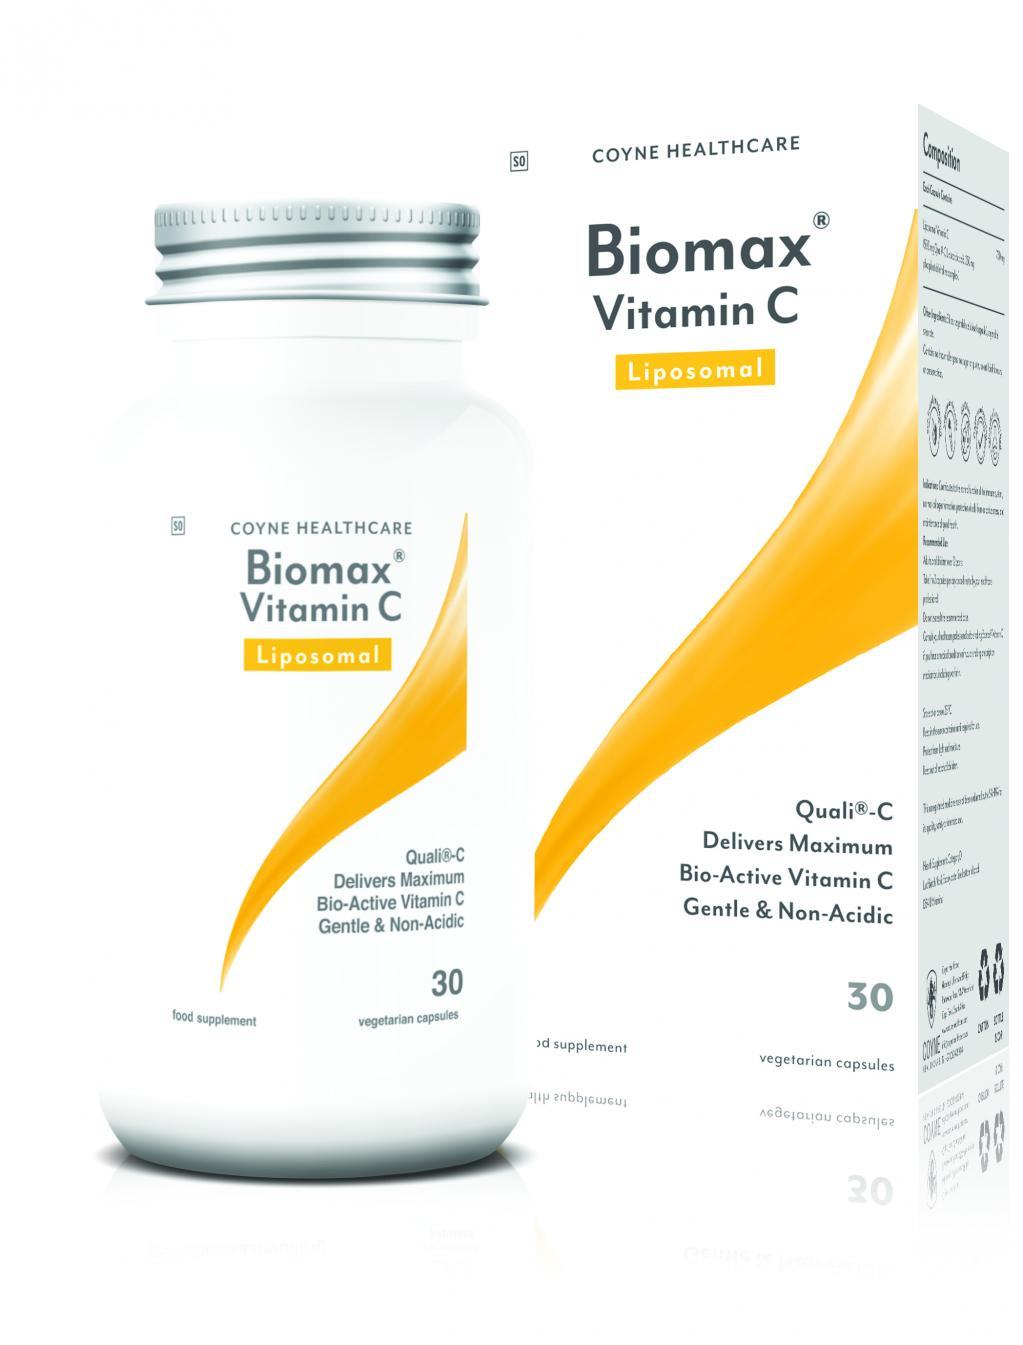 Biomax Vitamin C Liposomal 30's